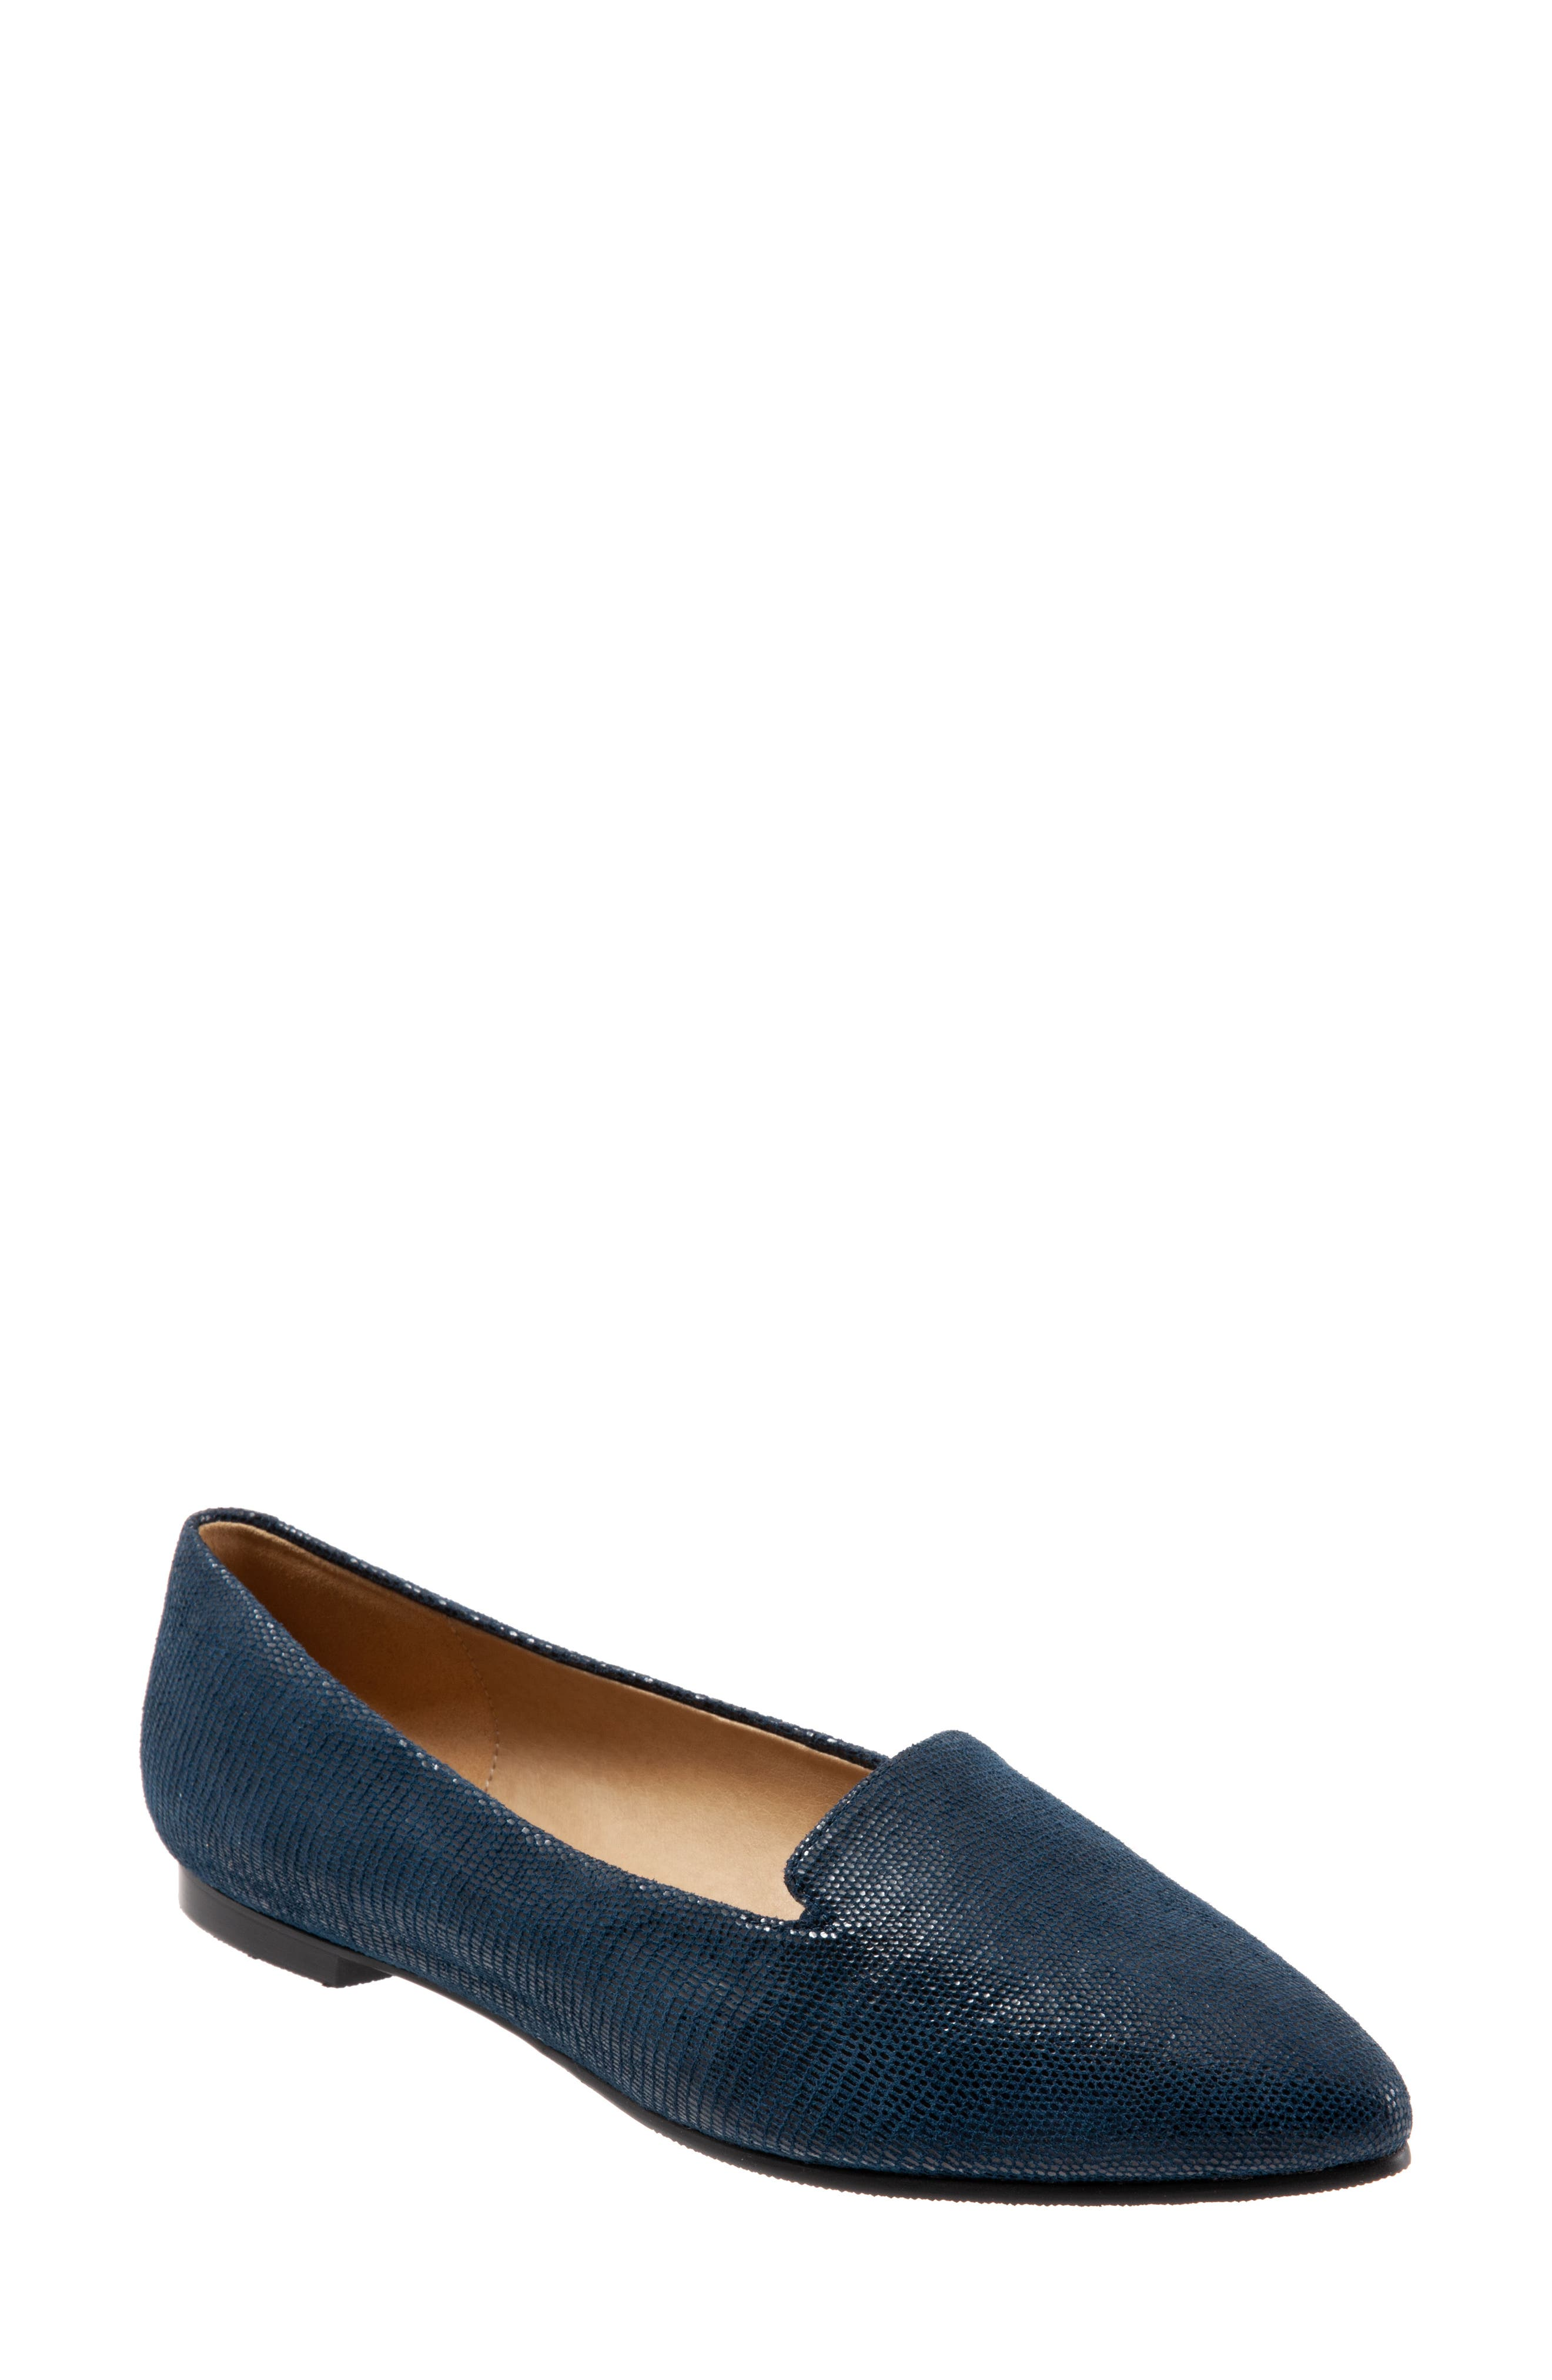 Trotters Harlowe Pointy Toe Loafer, WW - Blue